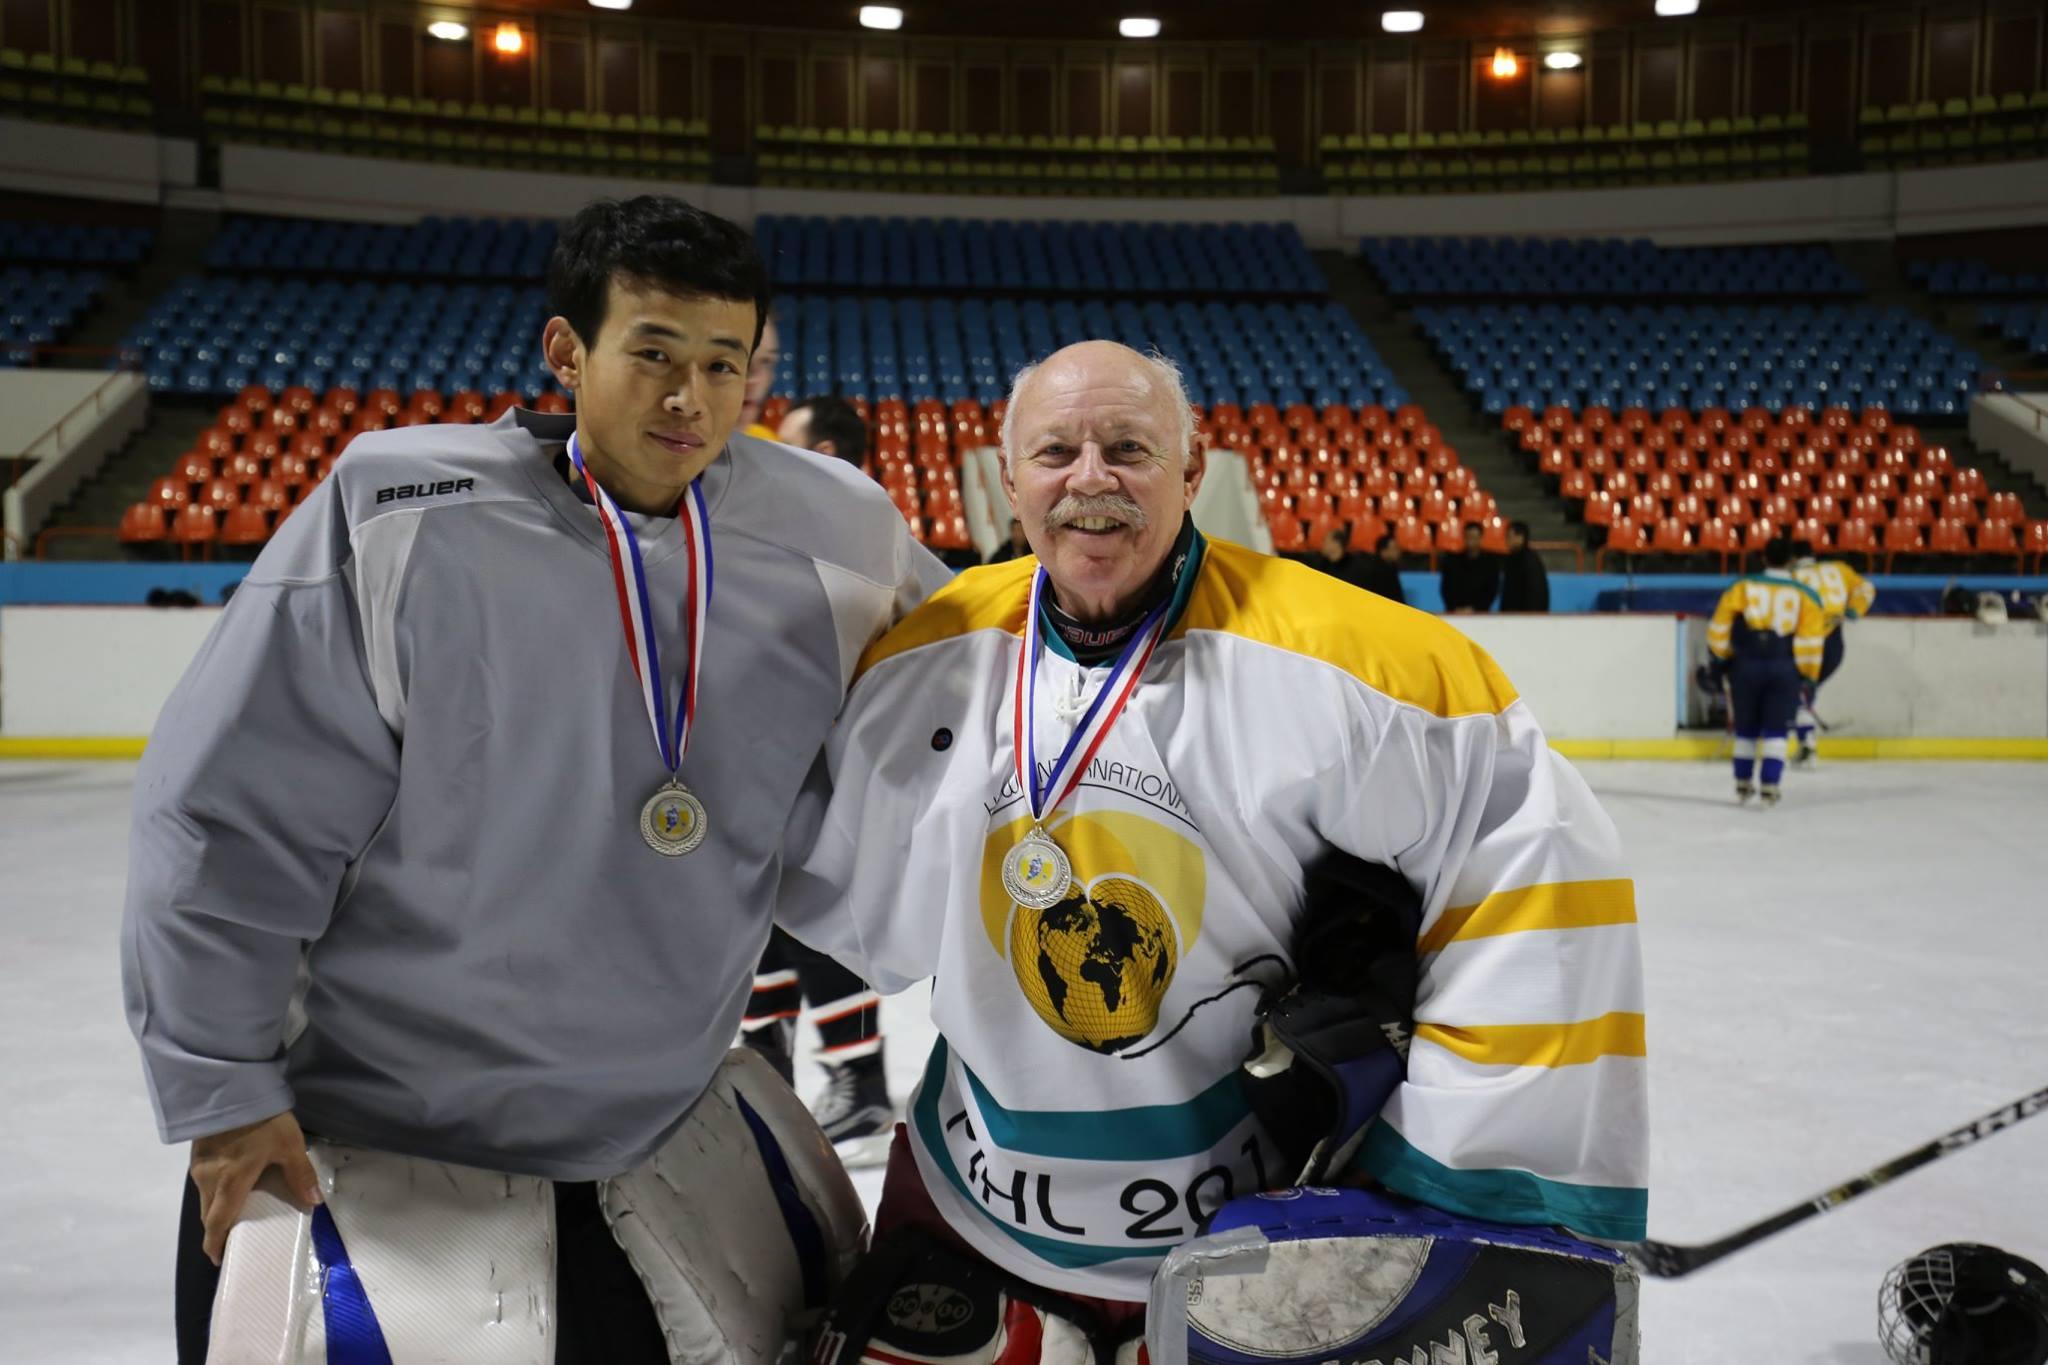 Yellow White skyblue hockey uniforms jerseys